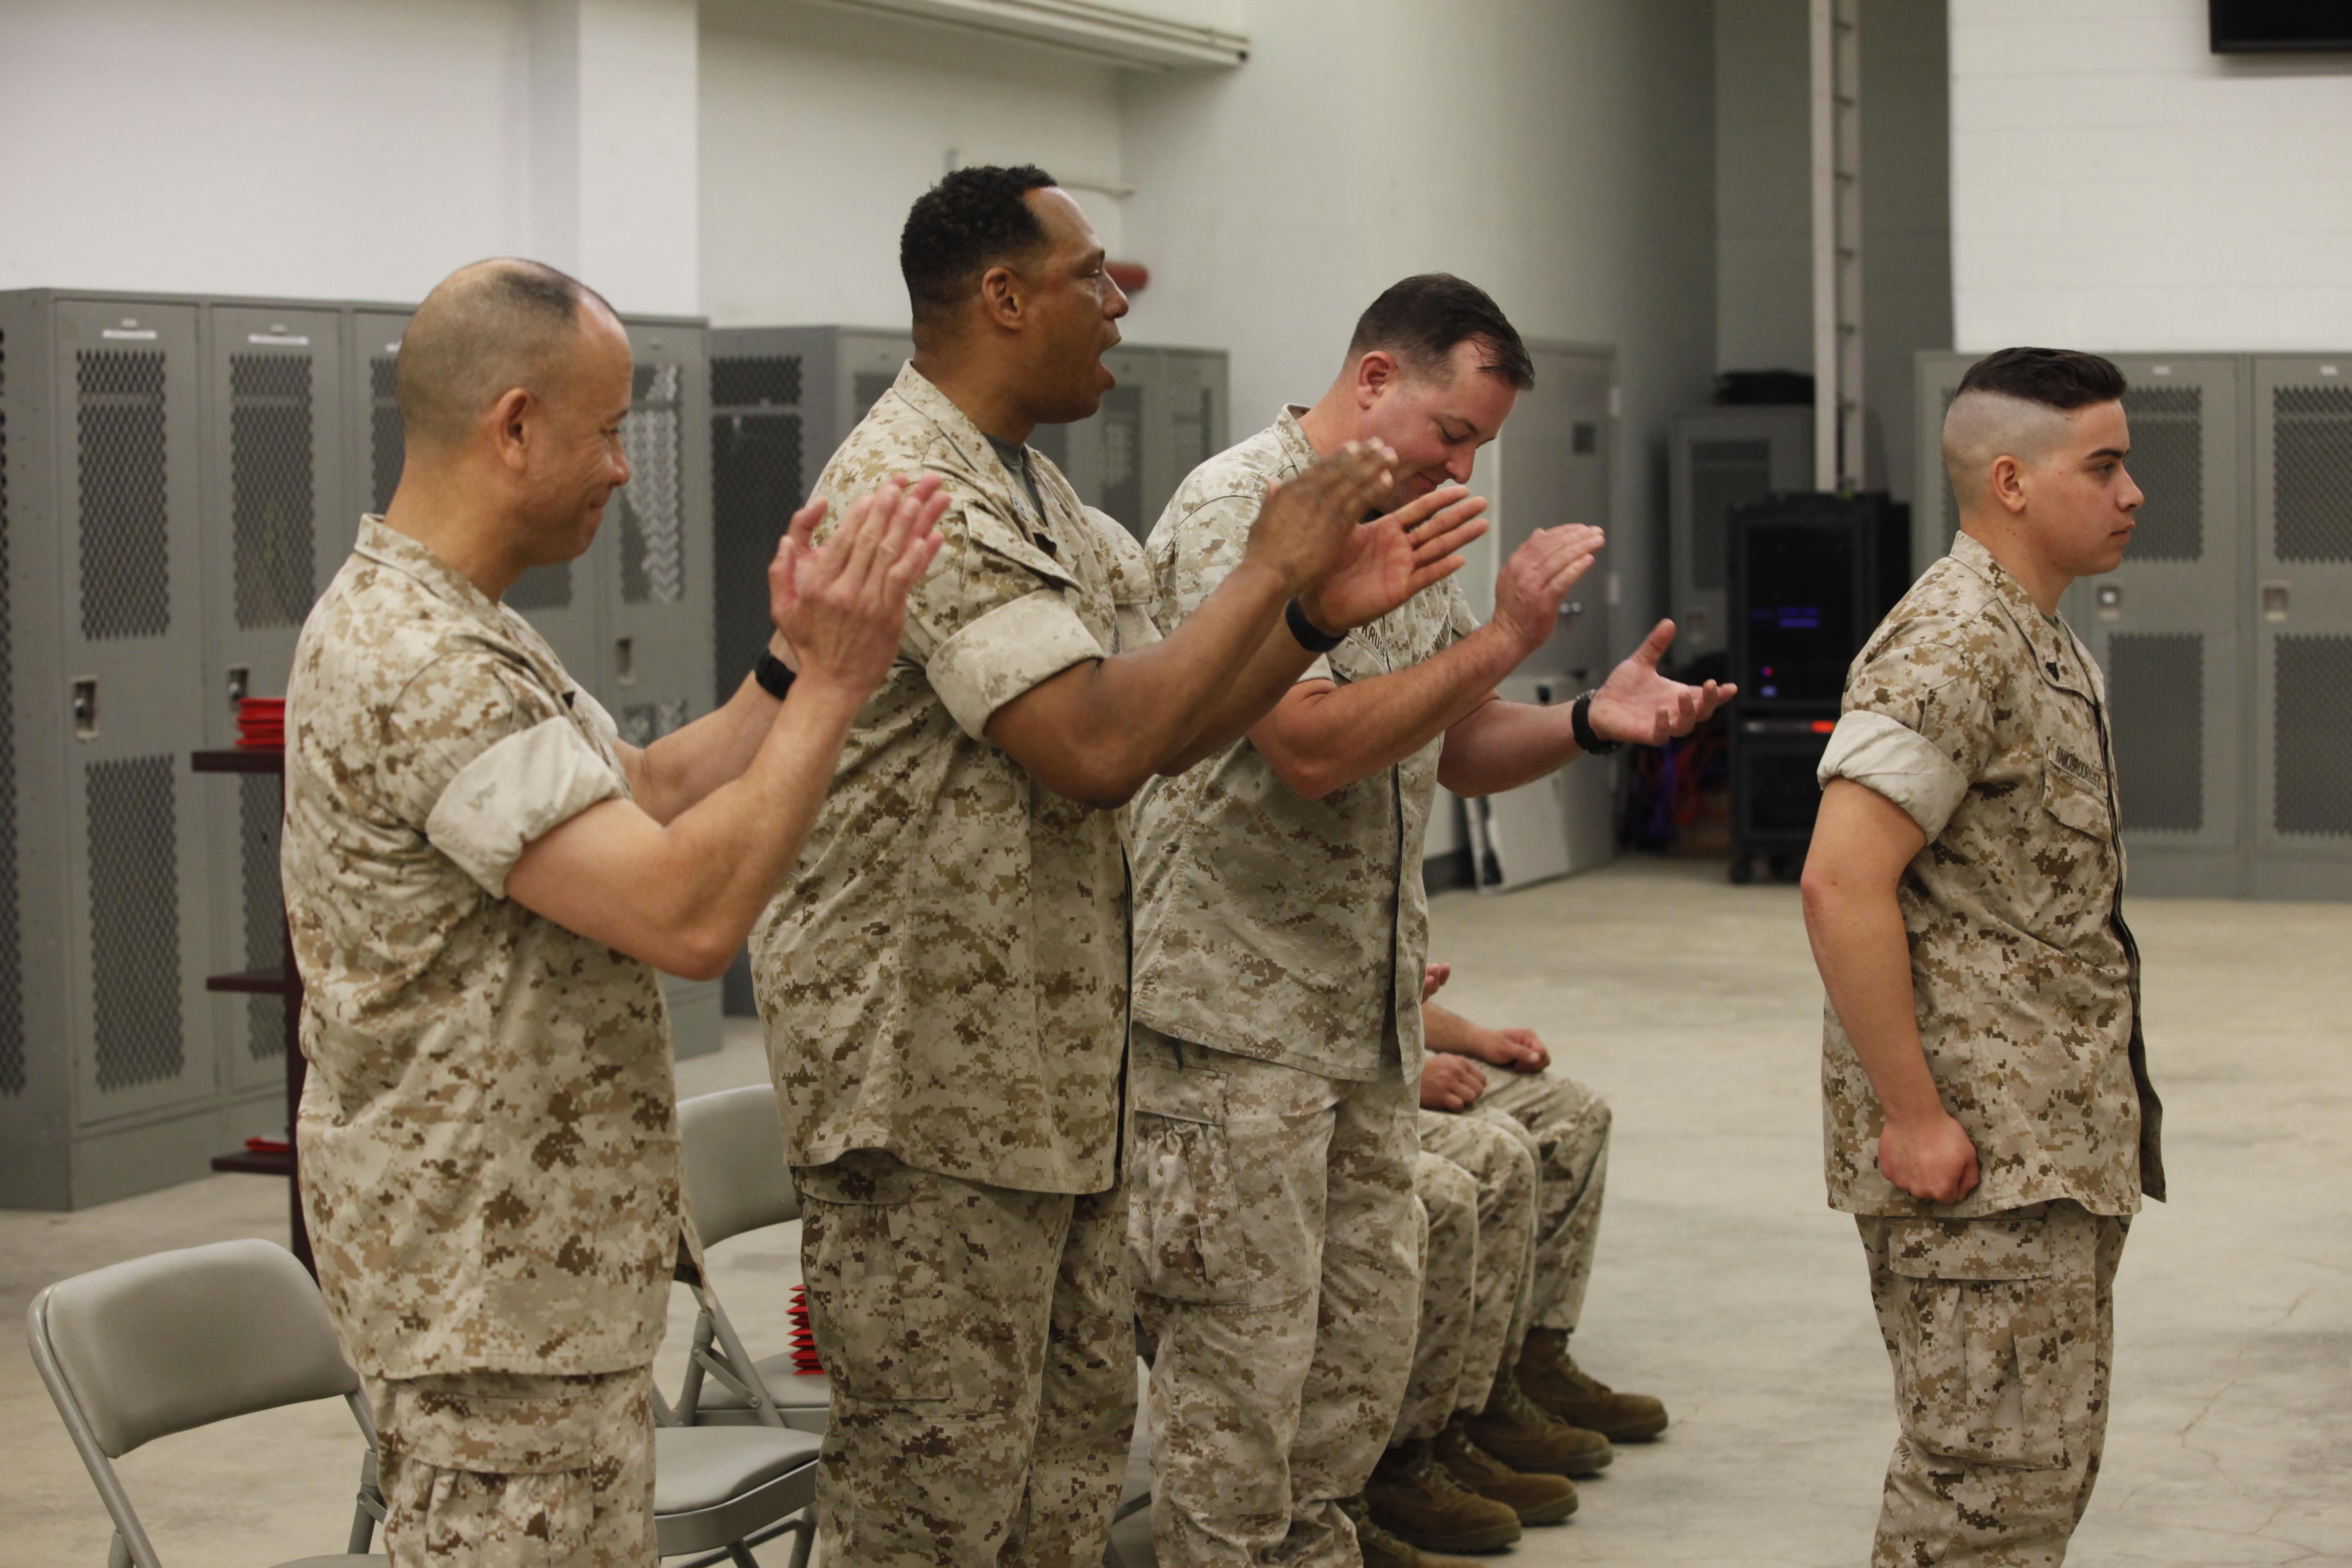 Essay on marine corps customs and courtesies